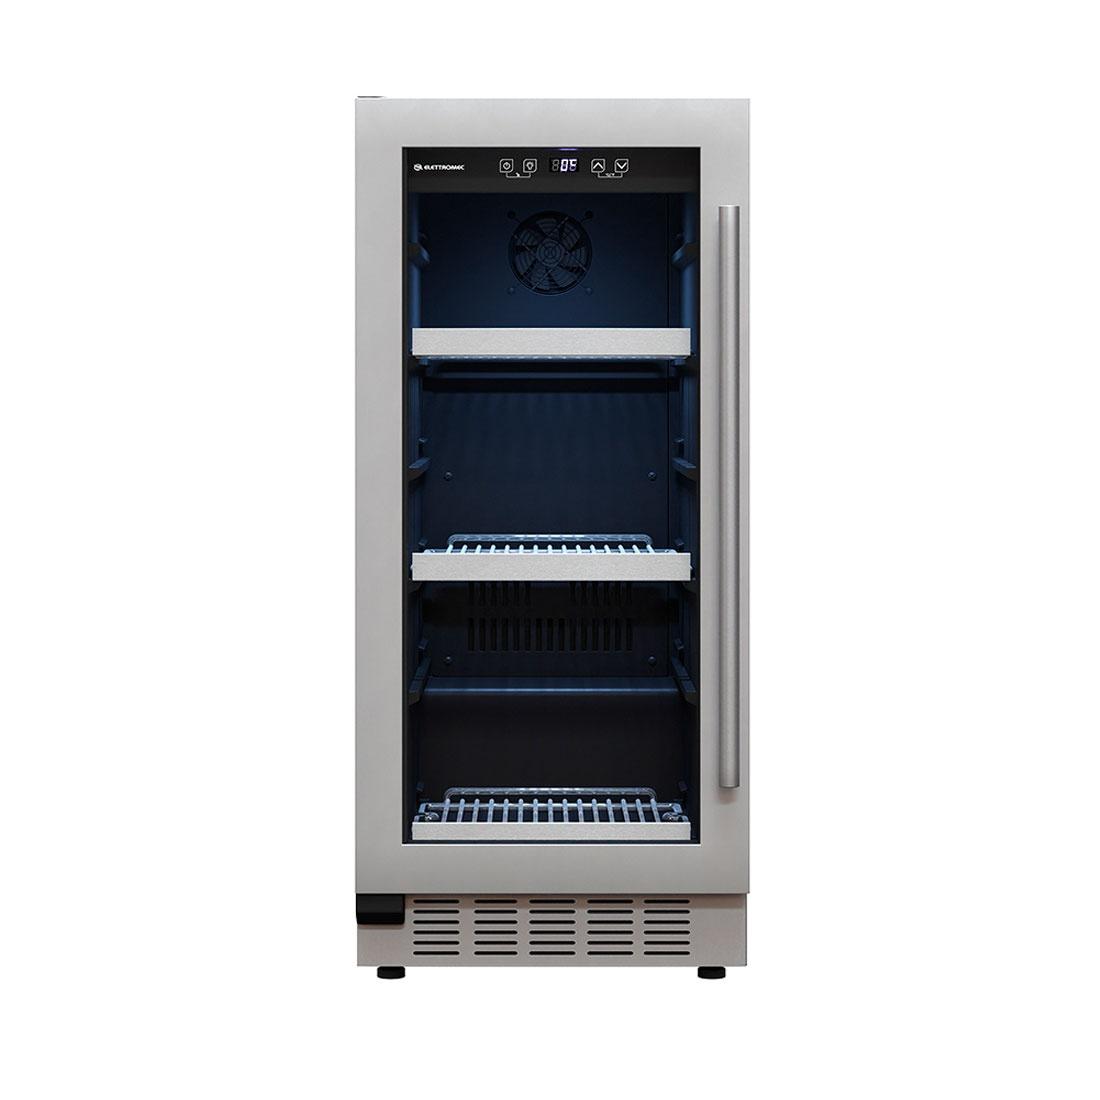 Frigobar Elettromec de Embutir 86 Litros  Inox 220V